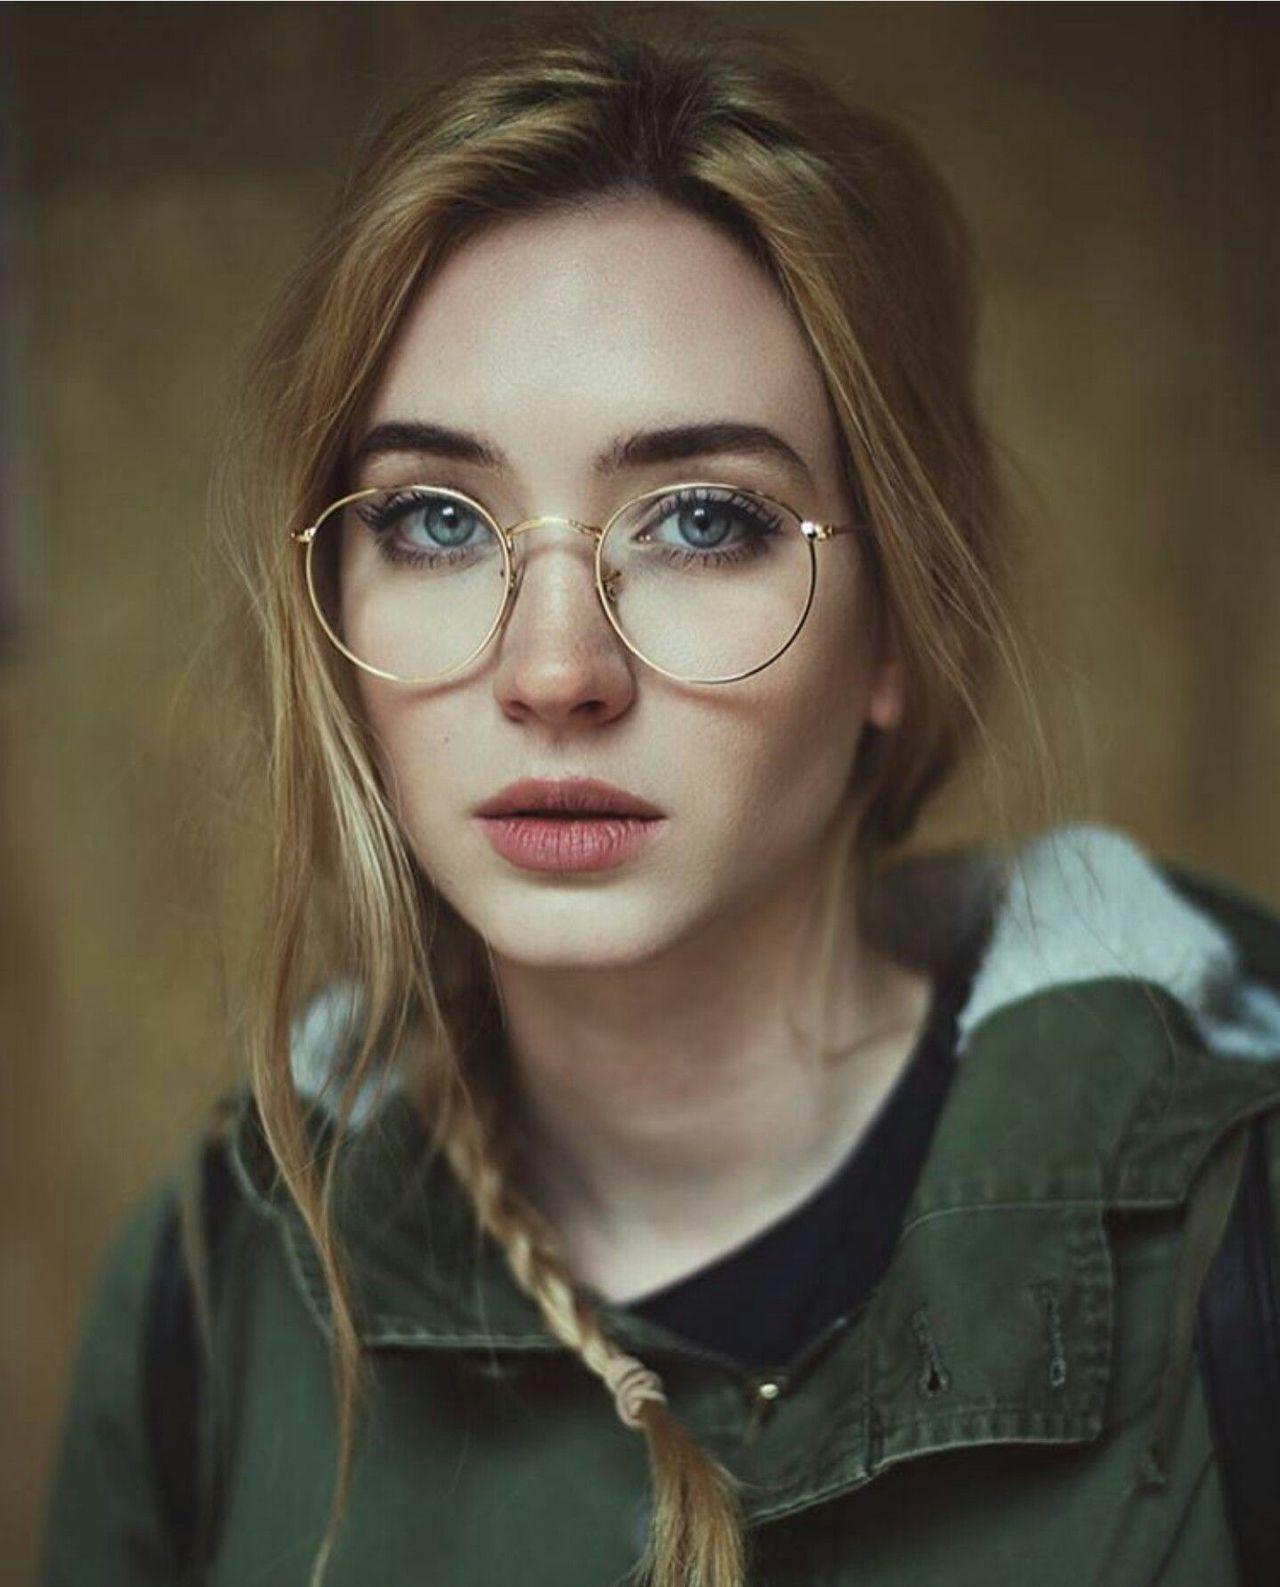 Carolina Porqueddu In Rayban Round Metal Eyeglasses Girls With Glasses Character Inspiration Portrait Photography